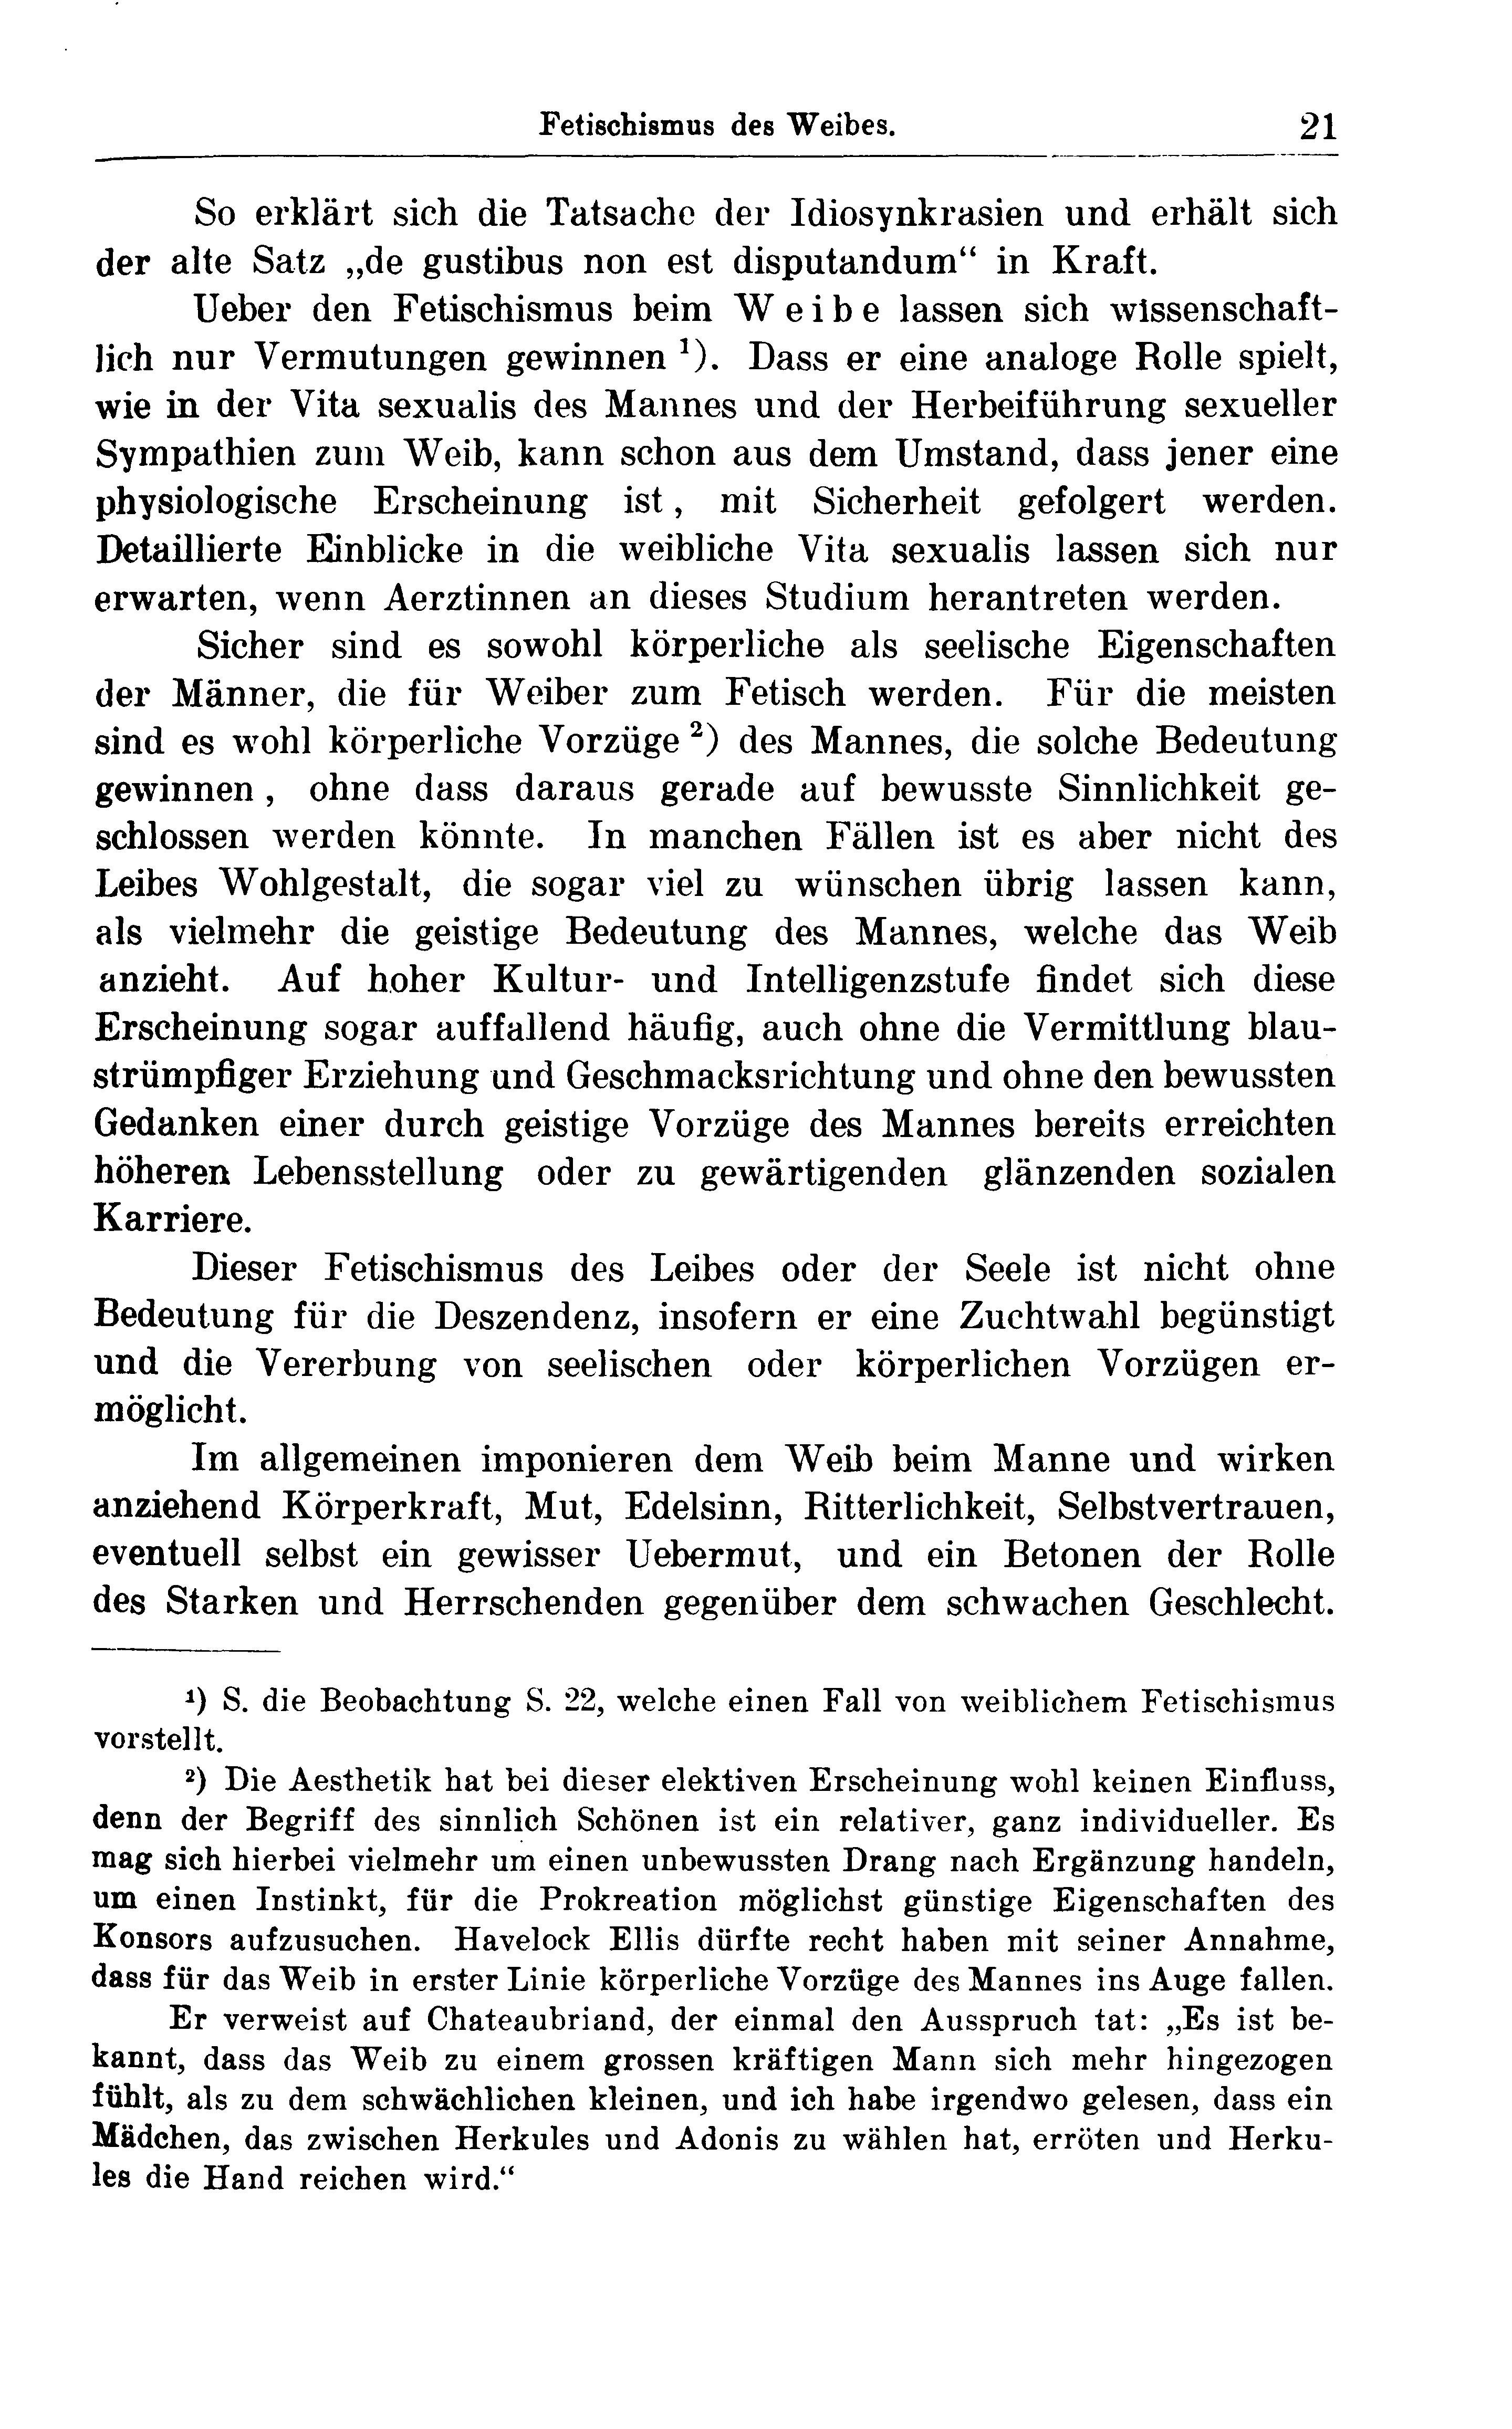 Krafft ebing psychopathia sexualis full text